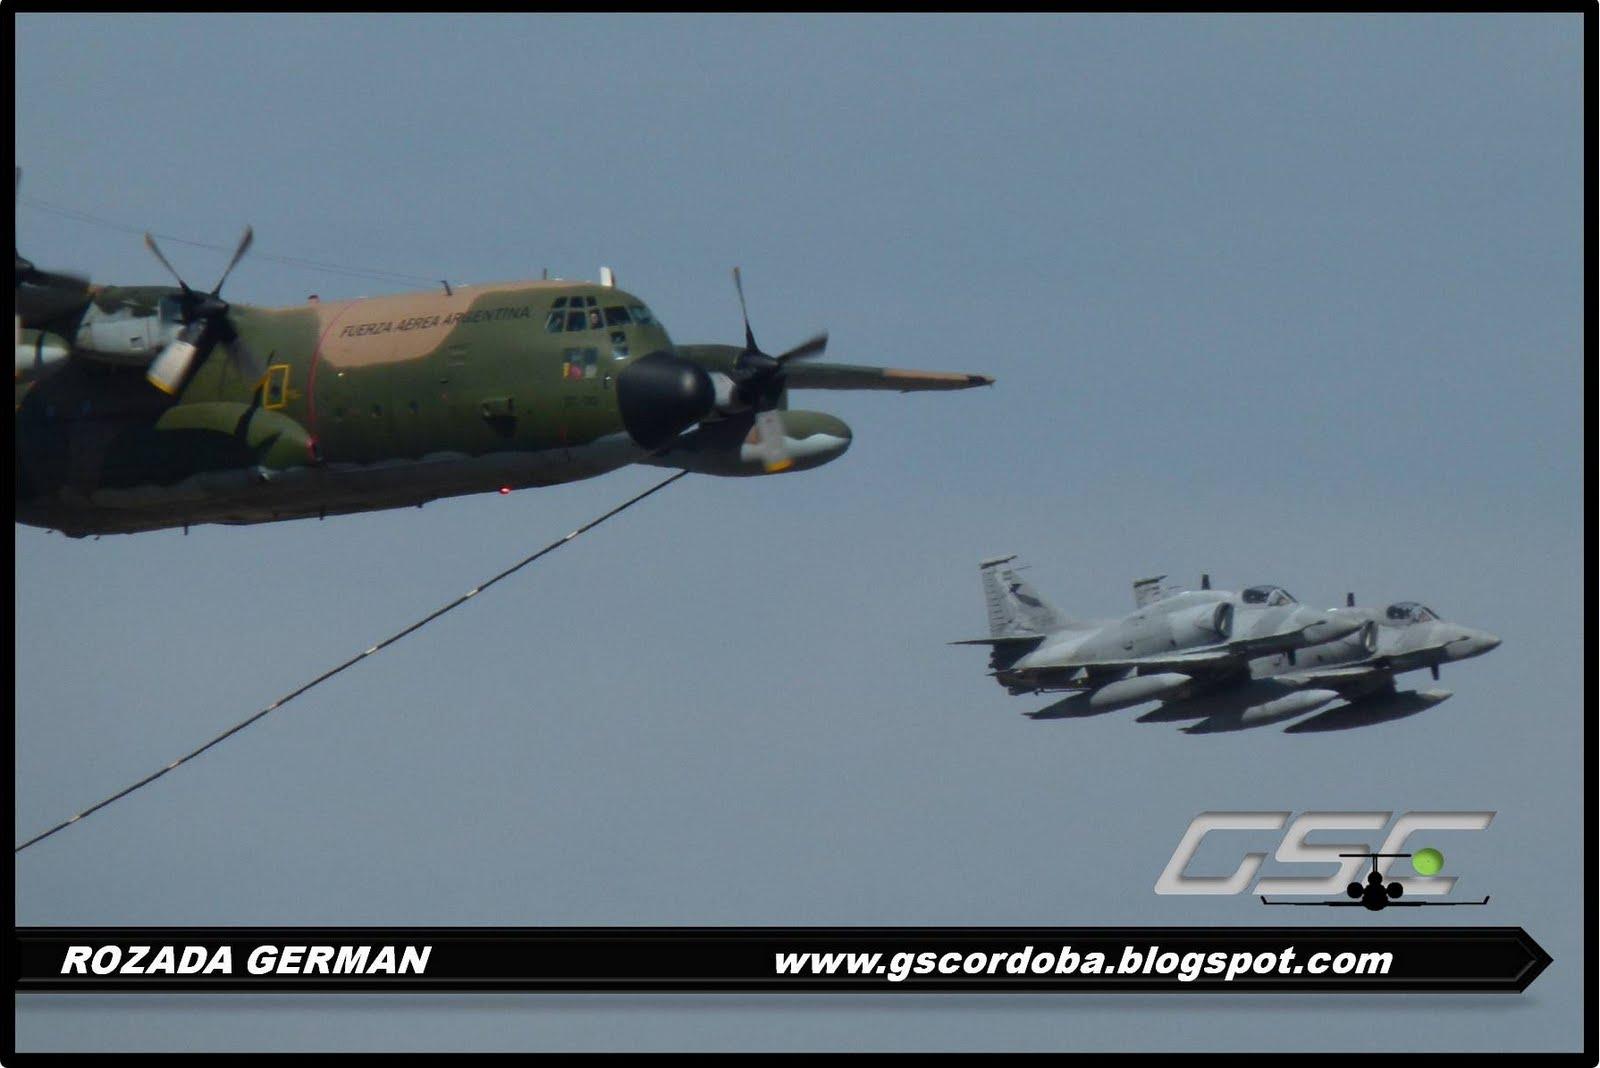 Fuerza aerea argentina